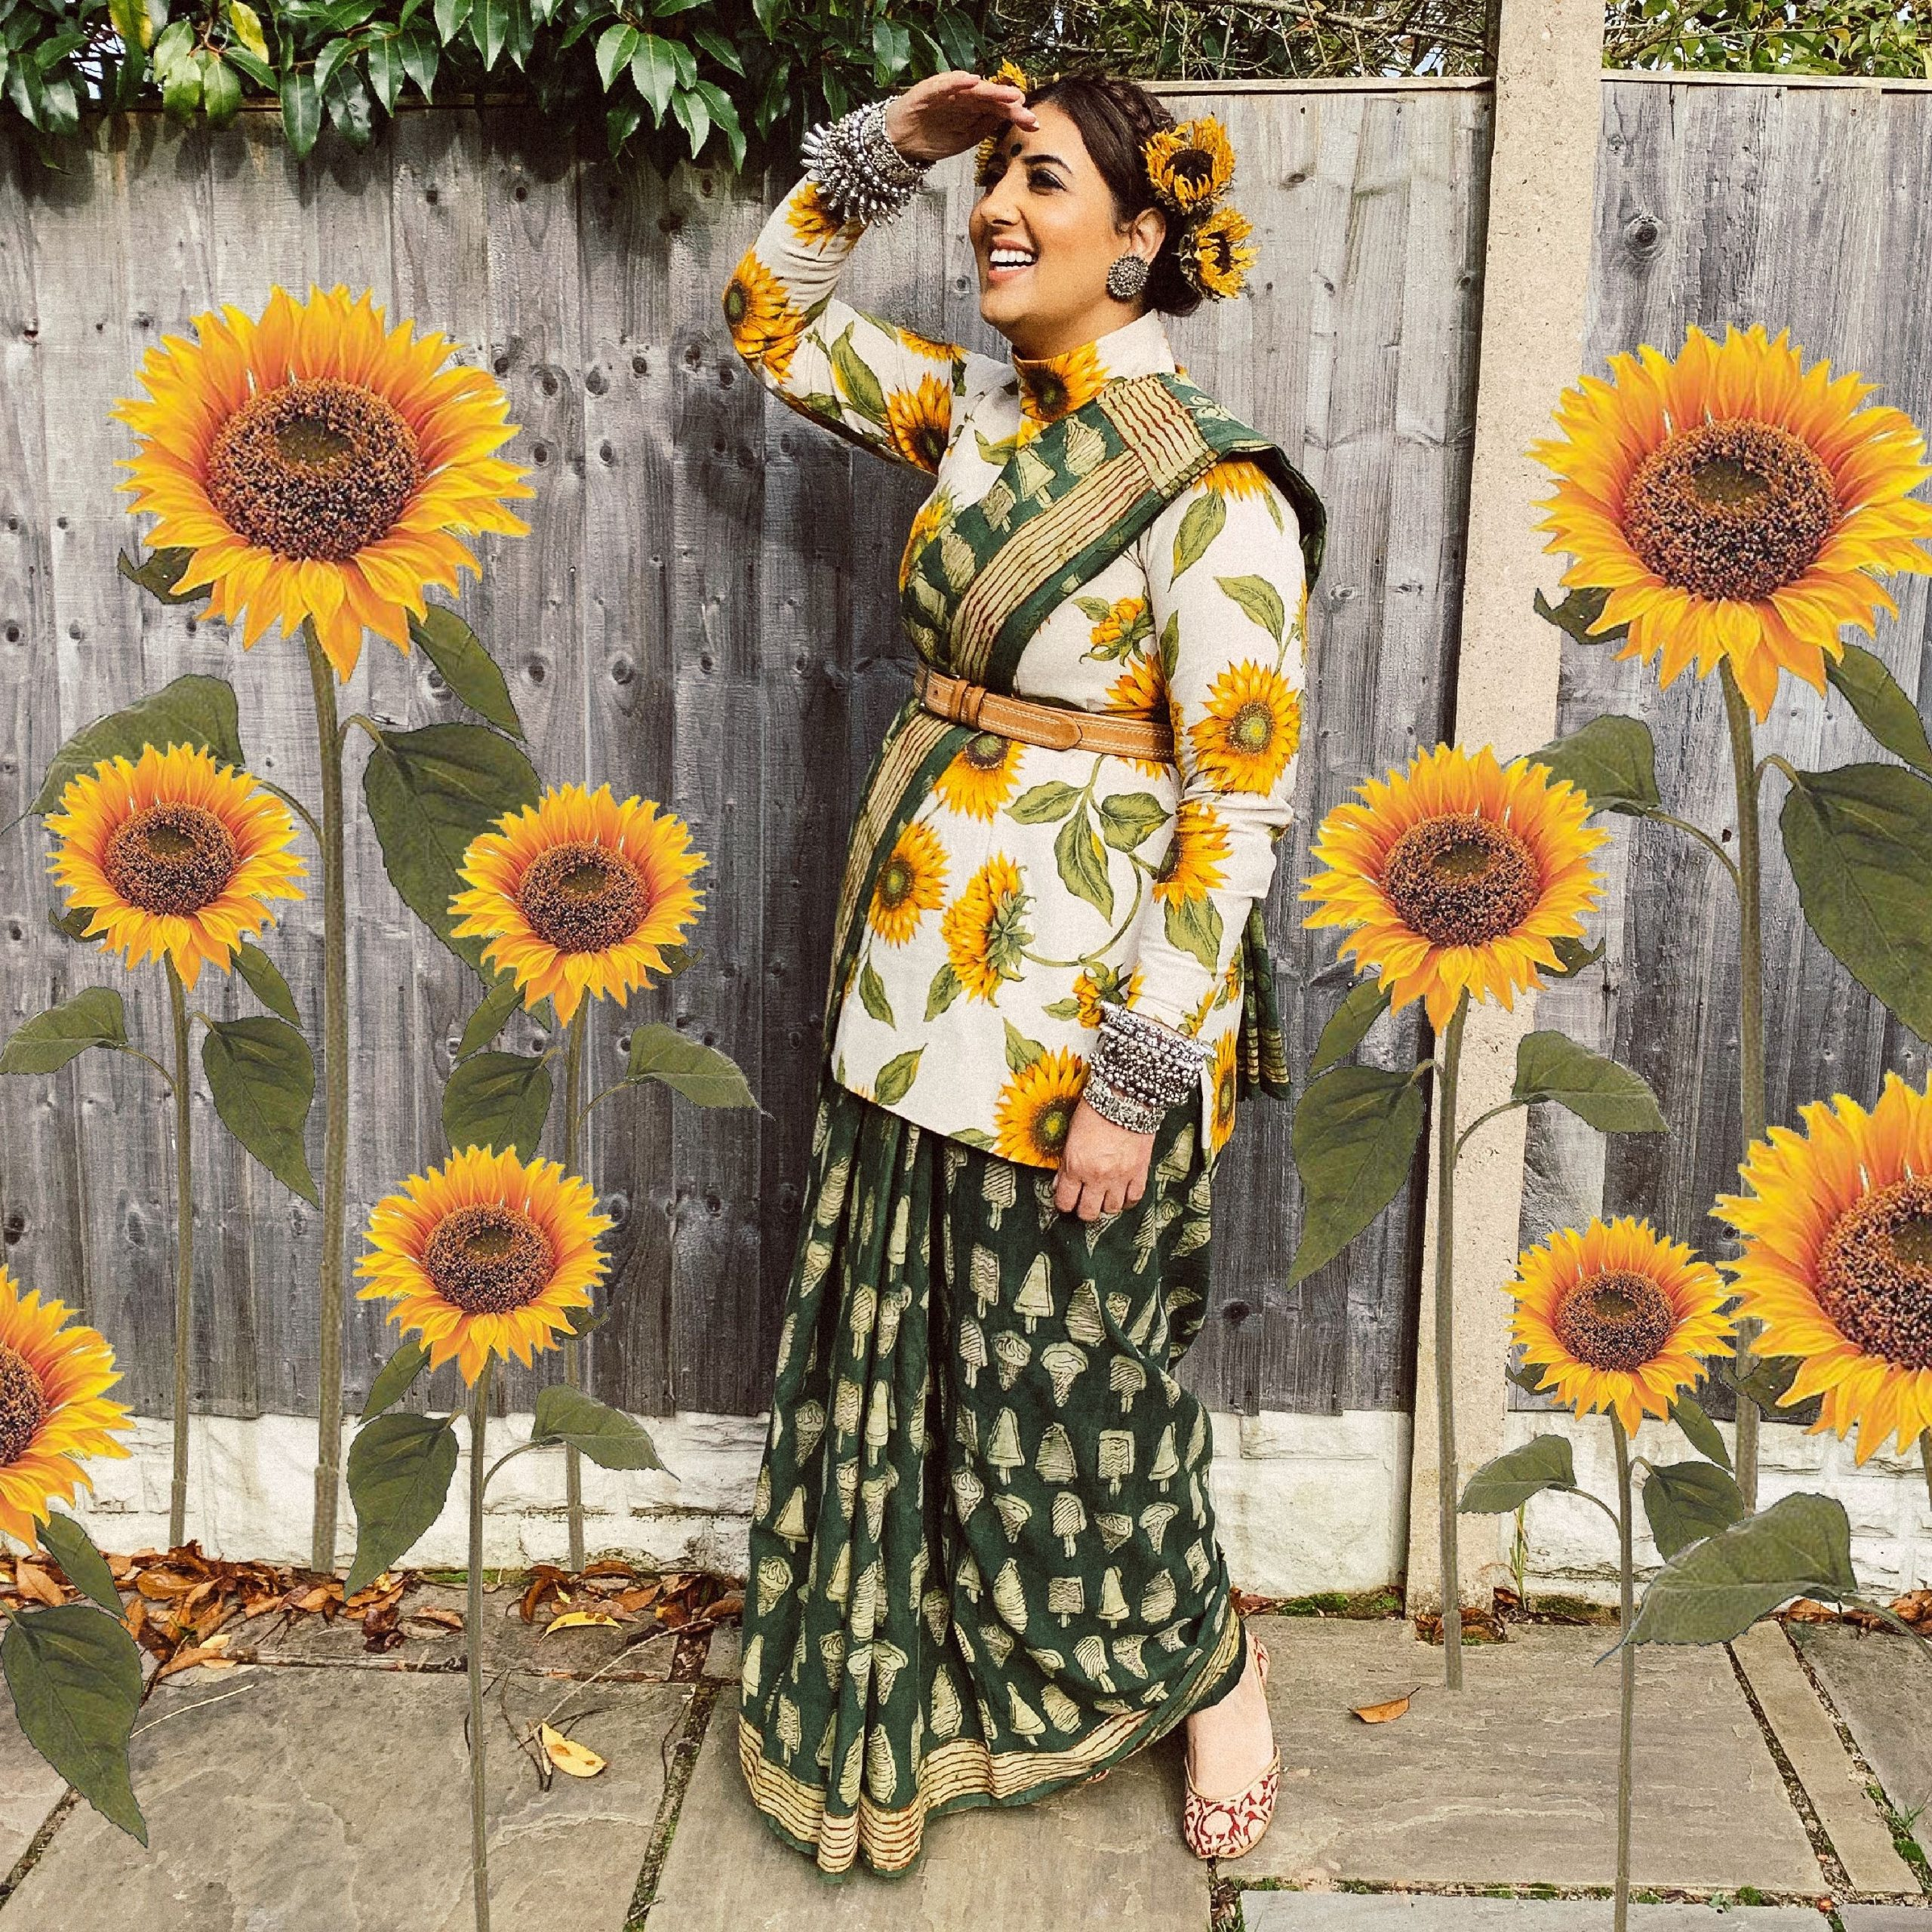 Sunflower Sisters By Monika Singh Gangotra